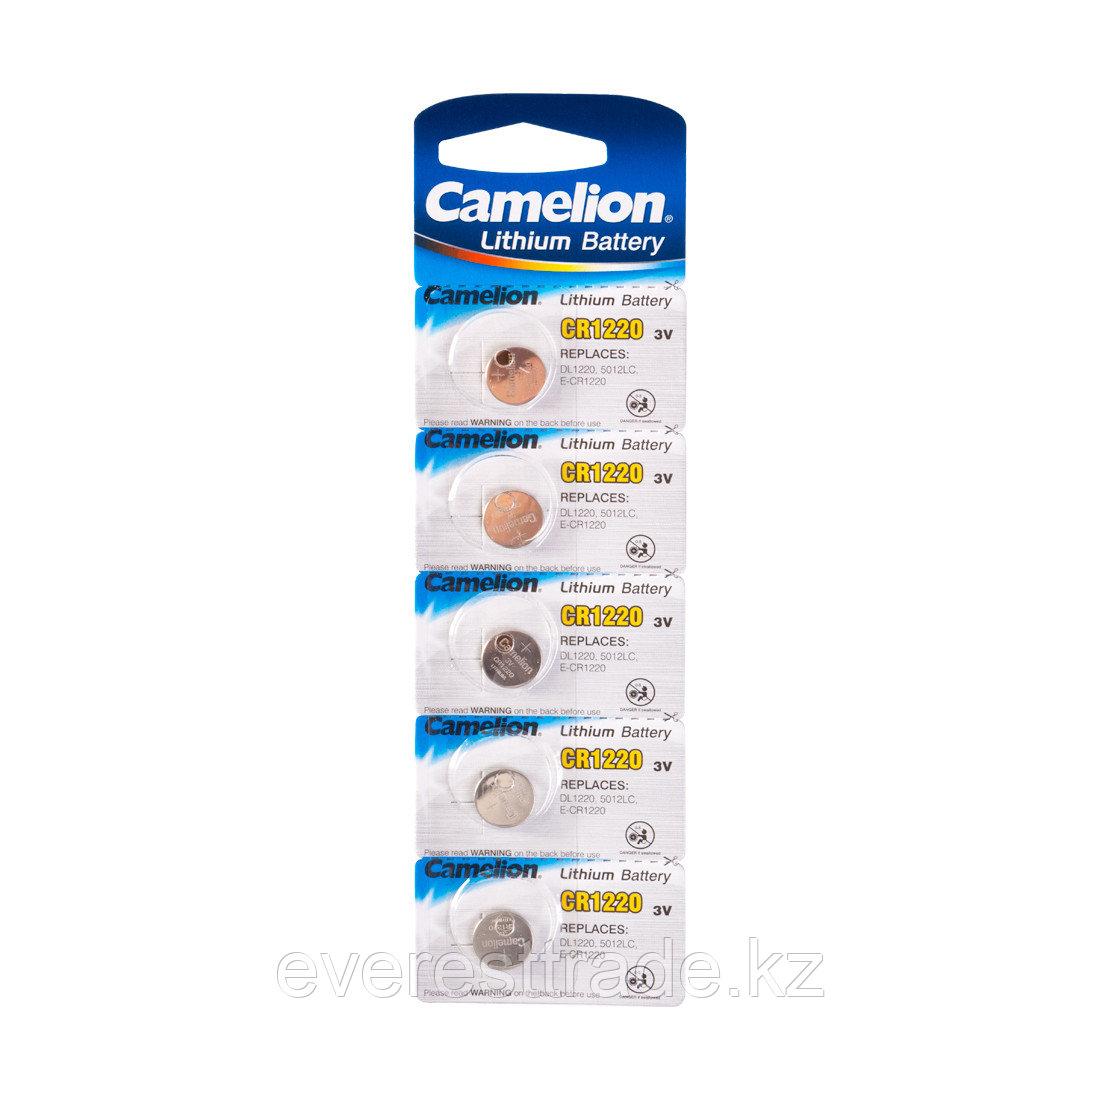 Camelion Батарейка, CAMELION, CR1220-BP5 Lithium Battery, CR1220 3V, 220 mAh, 5 шт. в блистере